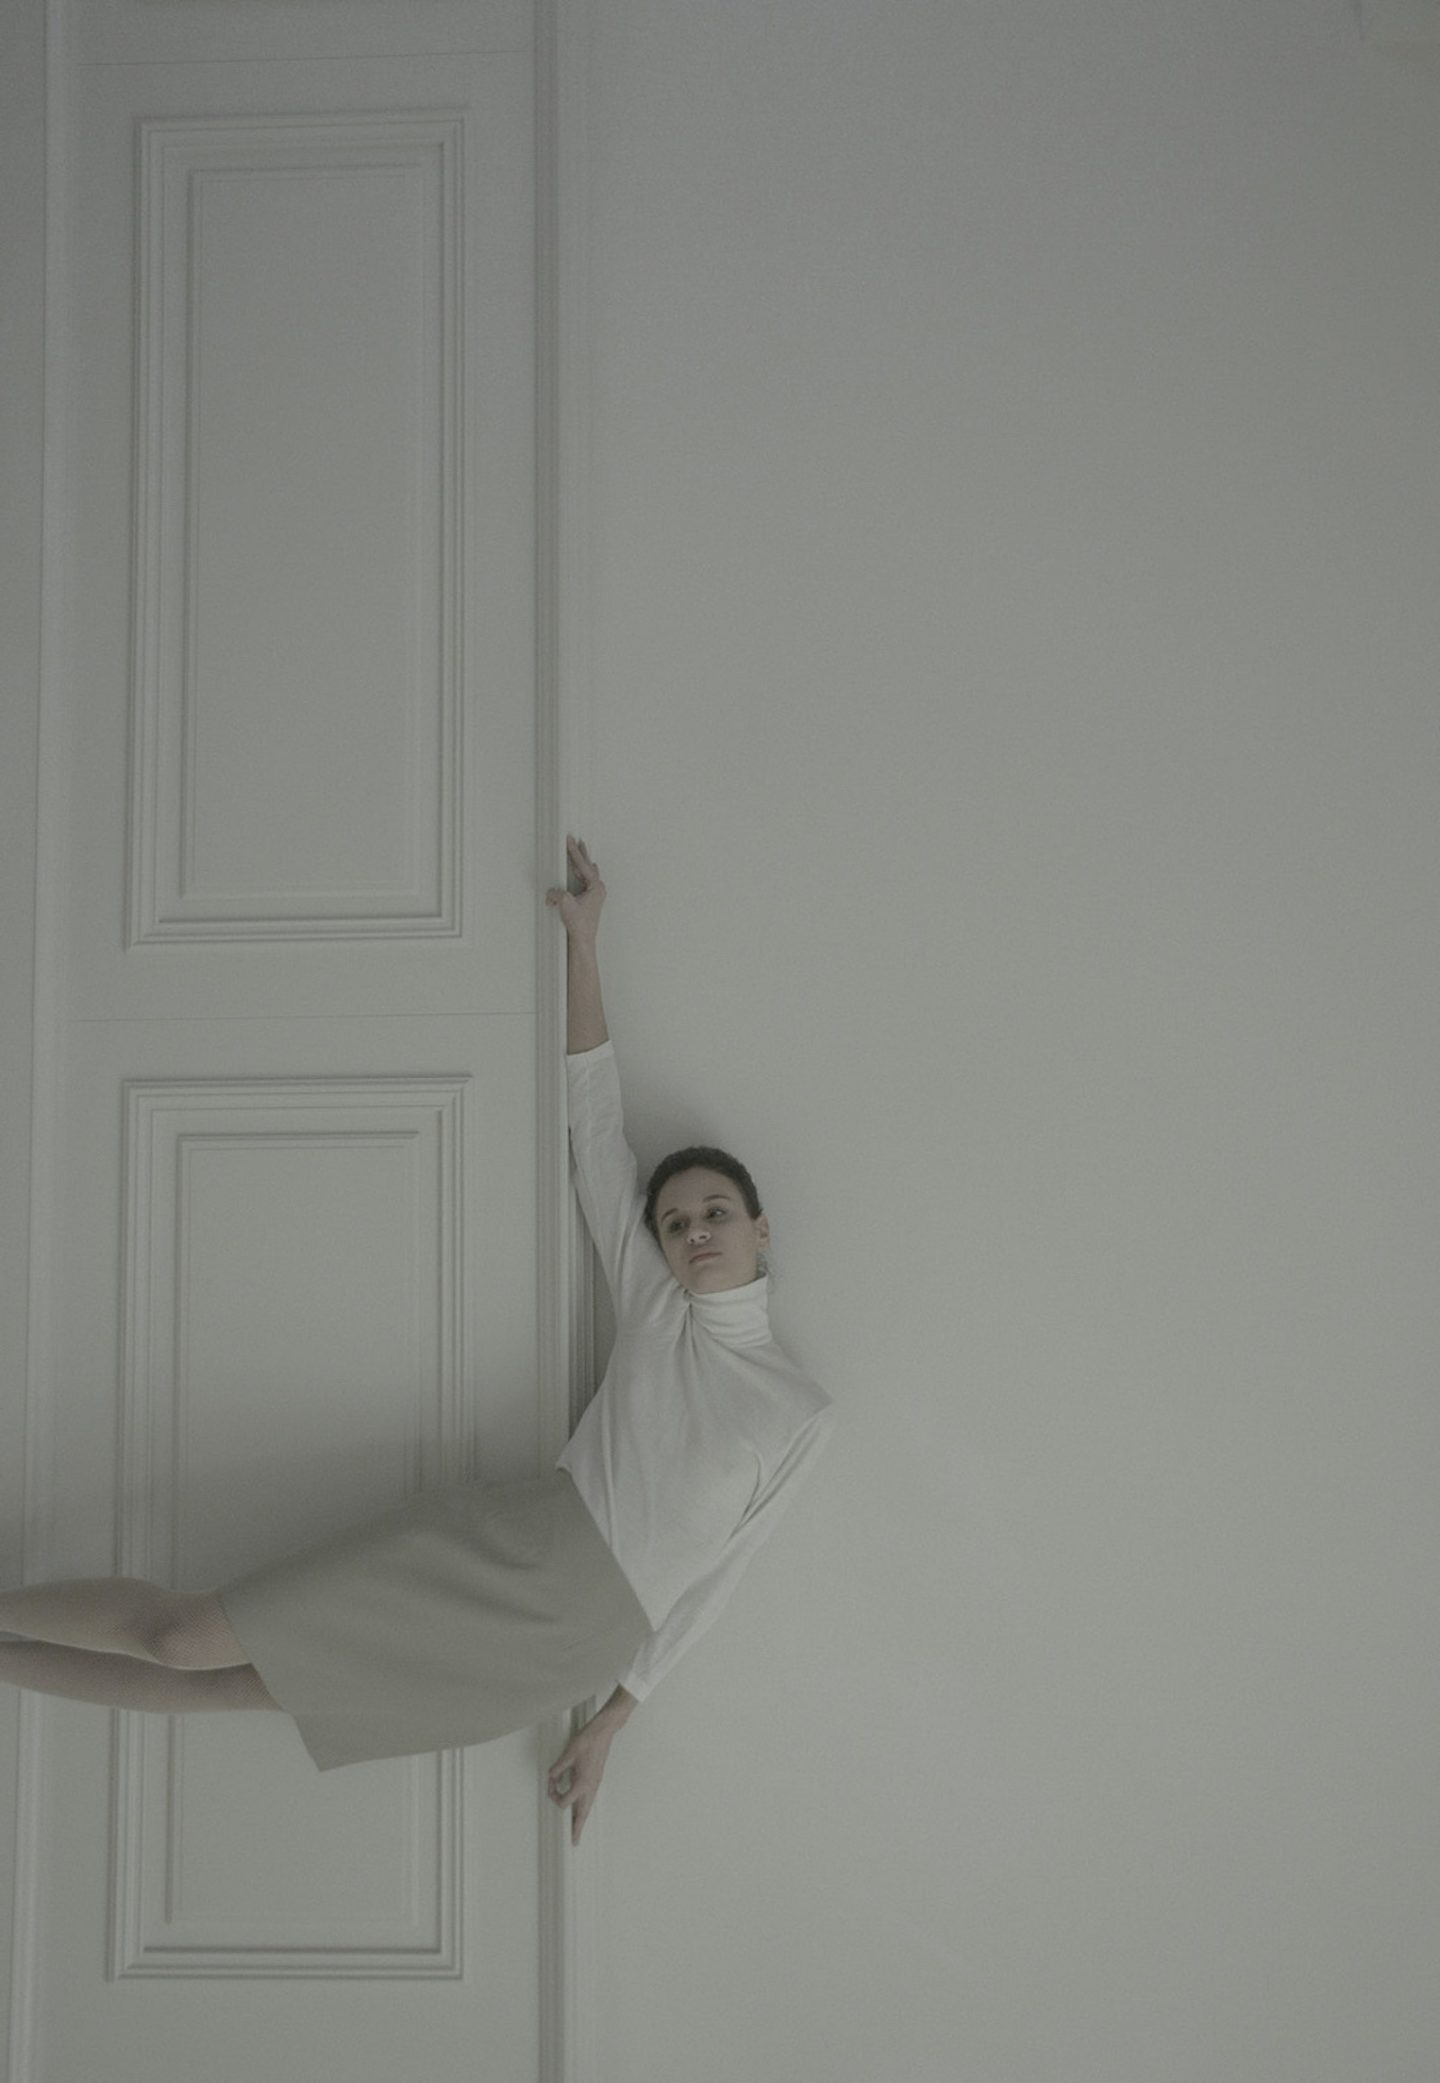 IGNANT-Photography-Cristina-Coral-Alternative-Perspective-014